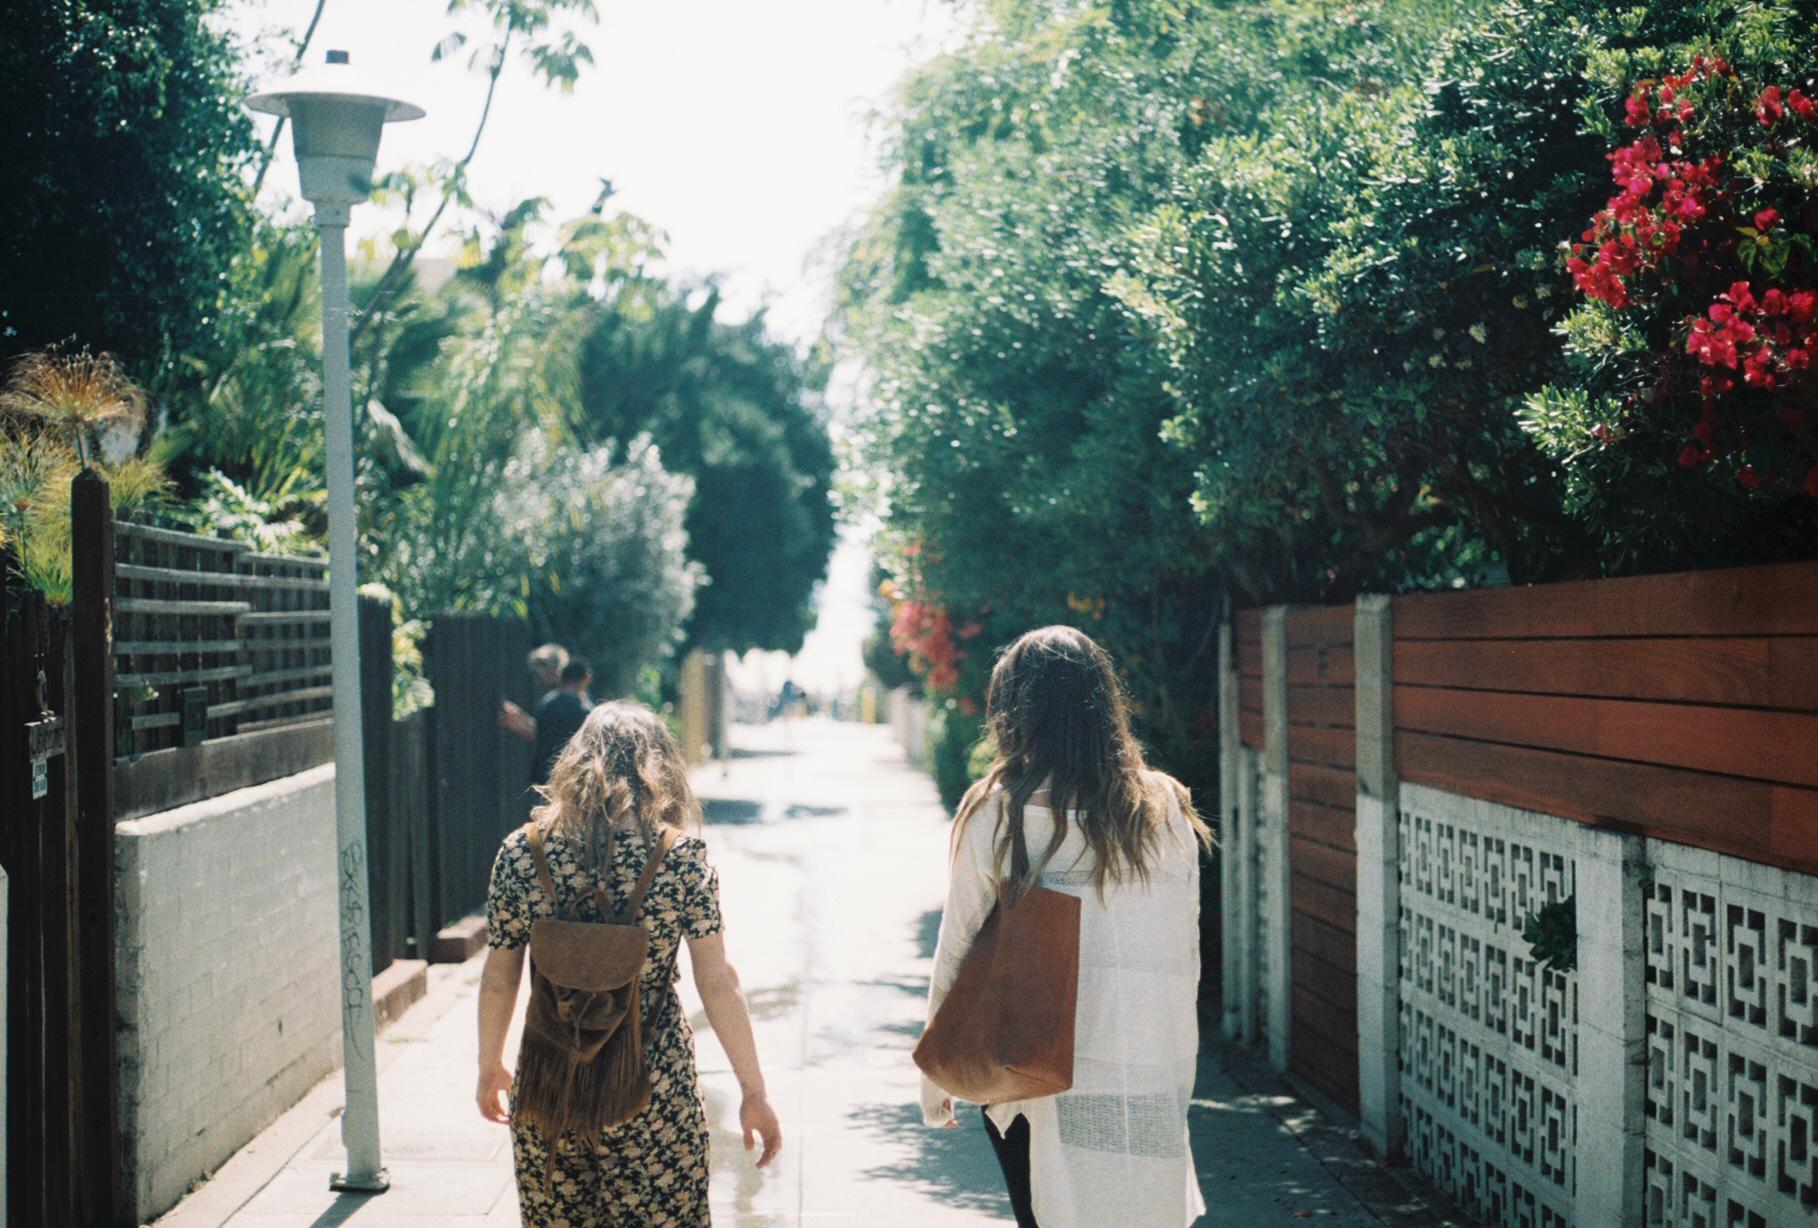 Venice, Califorinia - Michelle Essenburg, Kayley Elder